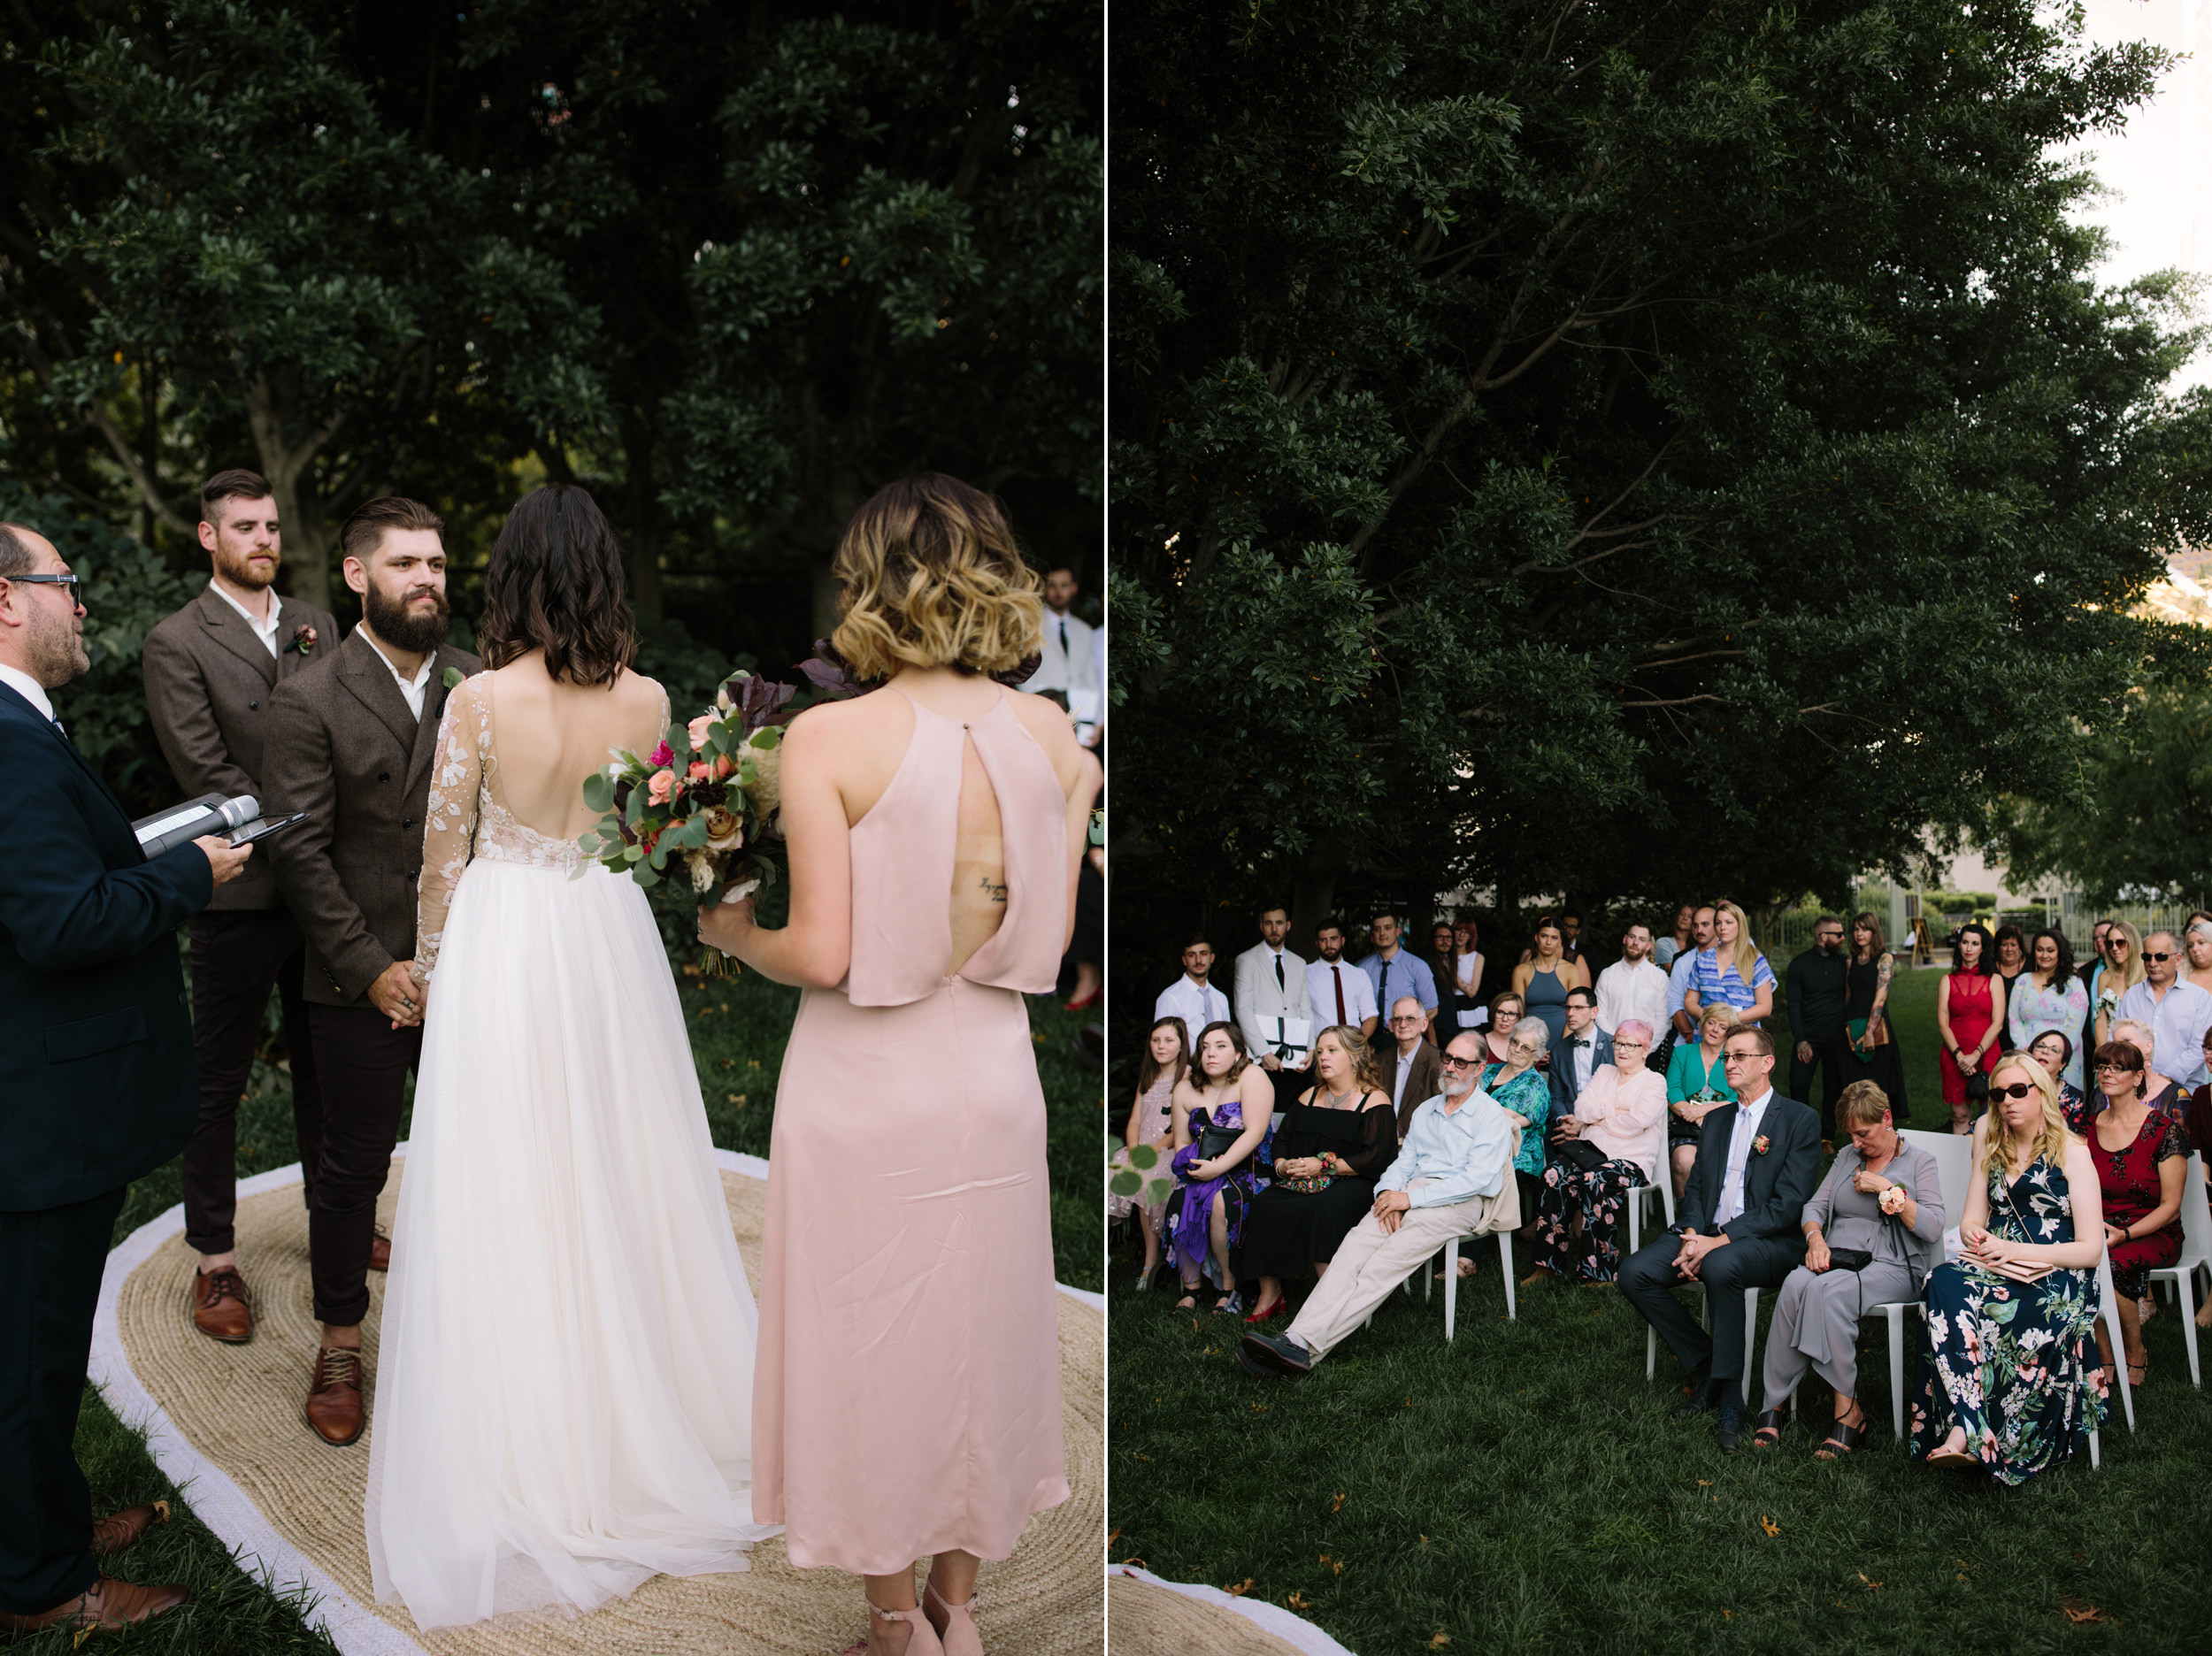 I-Got-You-Babe-Weddings-Hayley-Sam-NGV-Melbourne0062.JPG